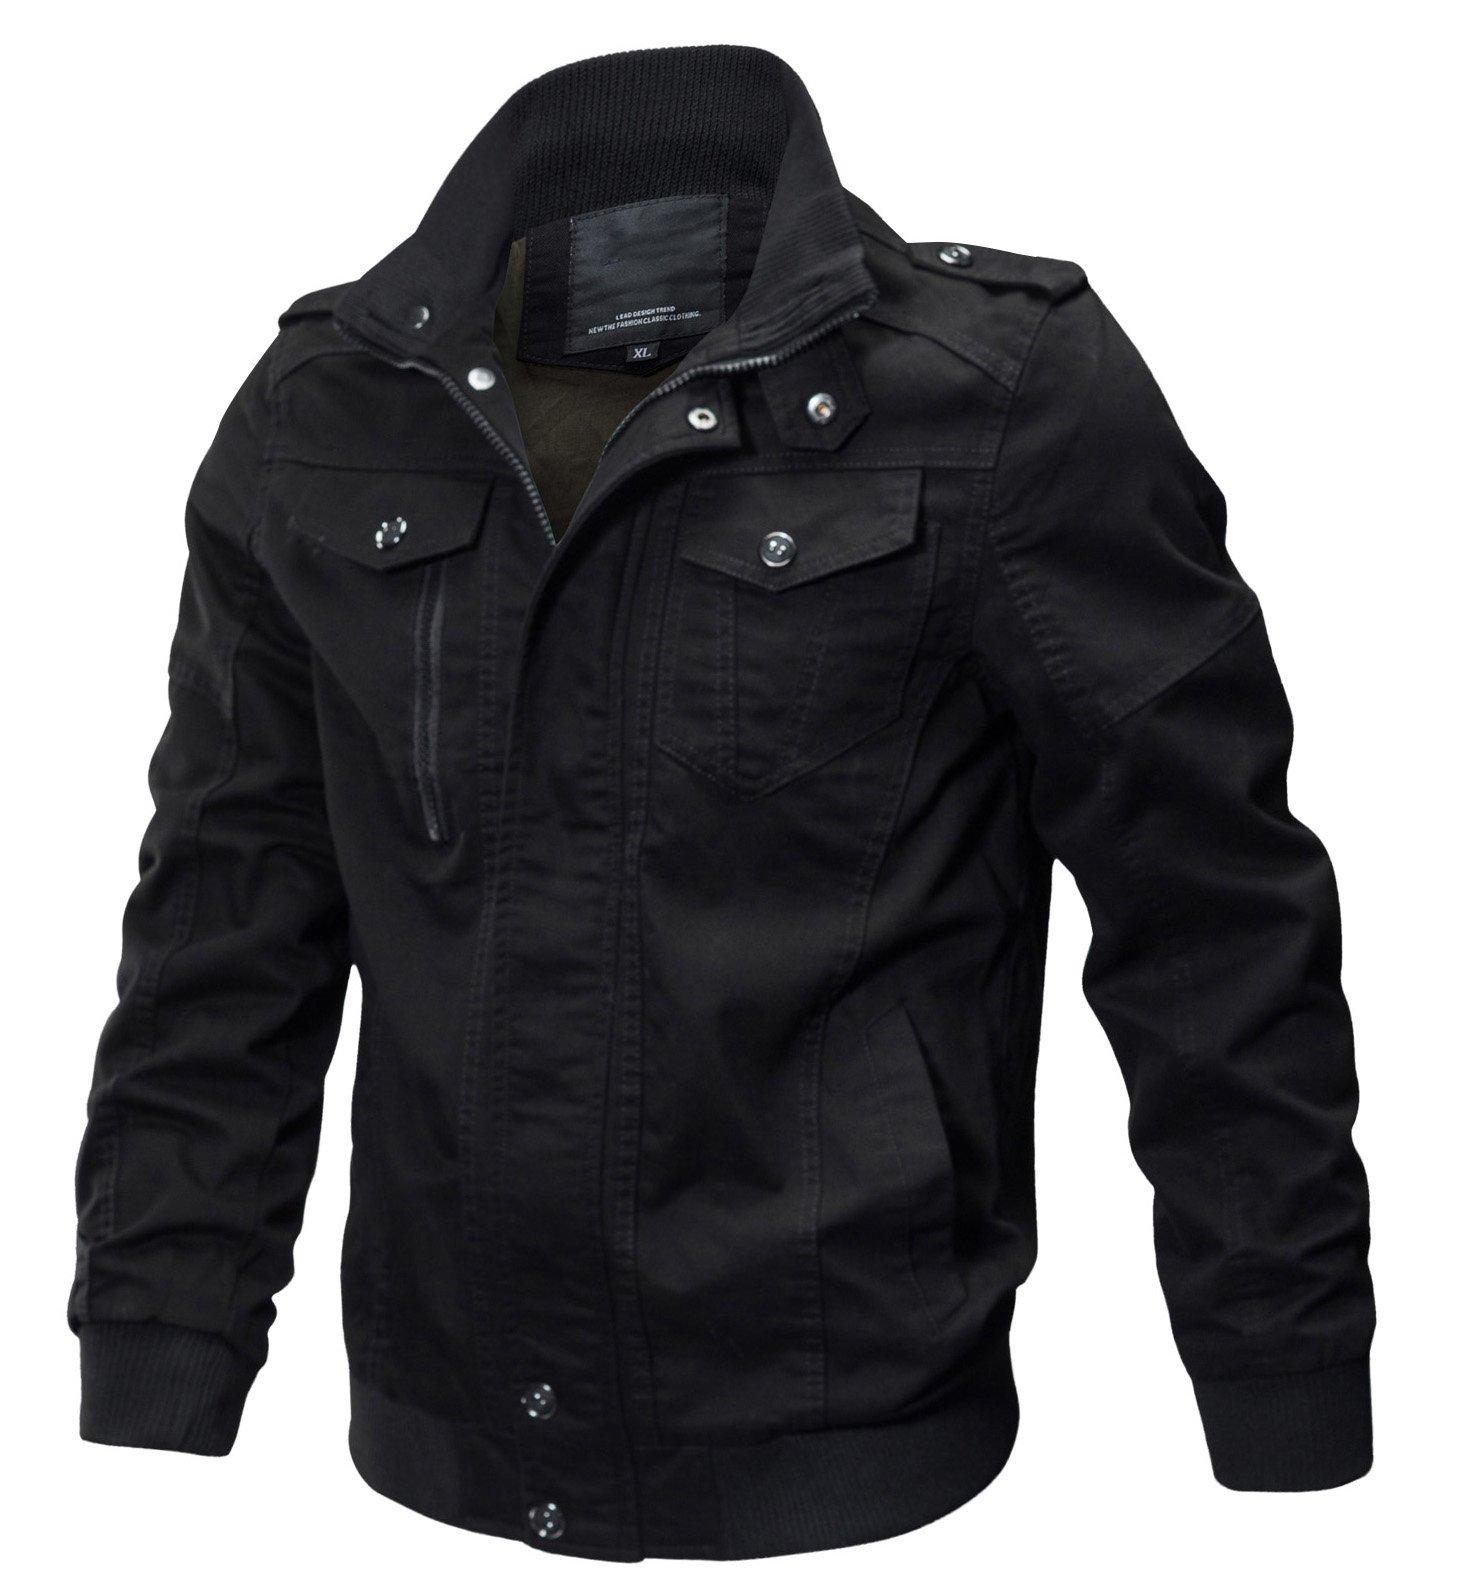 WULFUL Men's Cotton Military Jackets Casual Outdoor Coat Windbreaker Jacket Black M by WULFUL